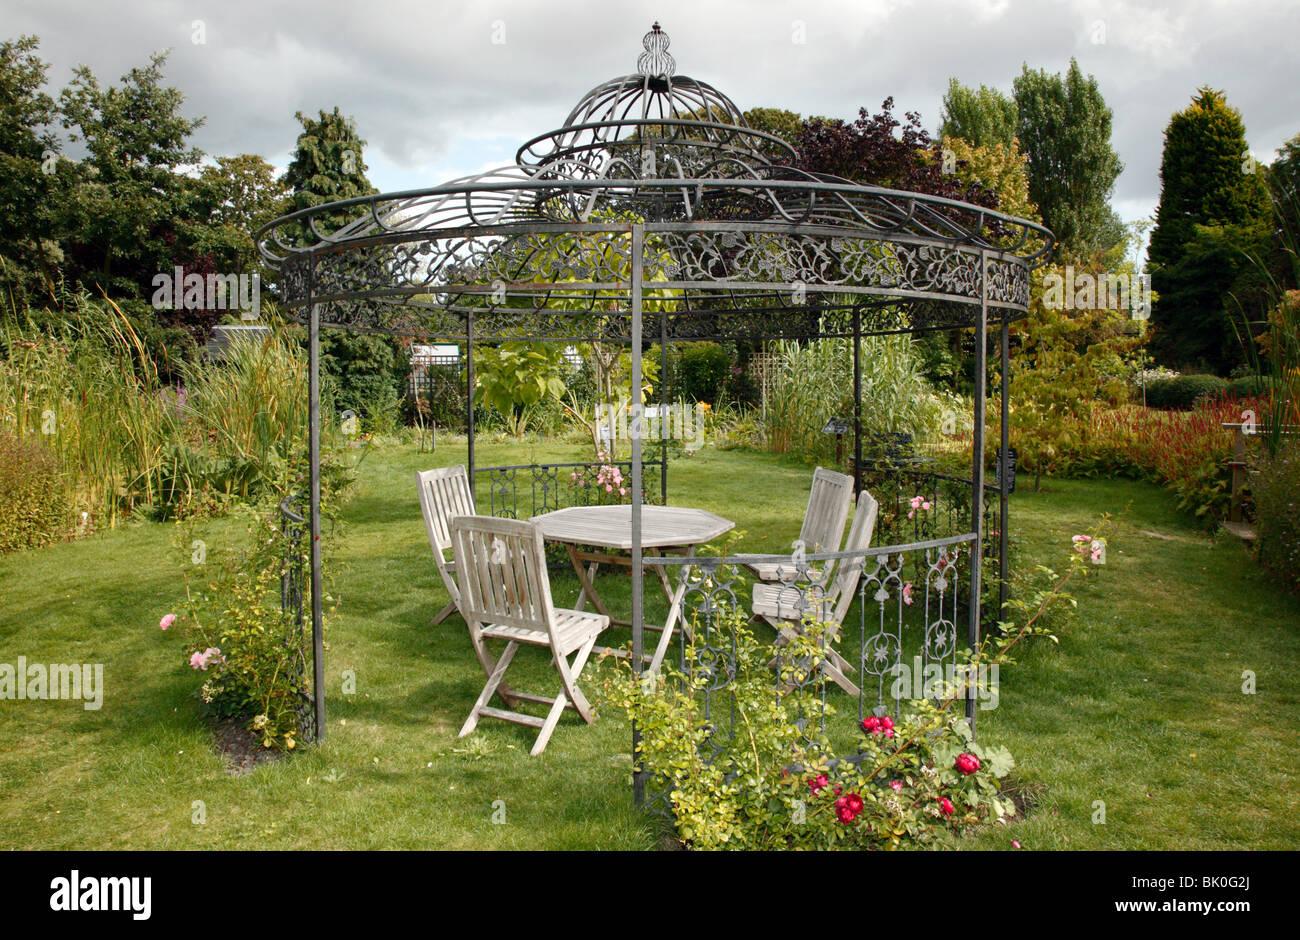 Garden Furniture Gazebo large metal gazebo containg garden furniture, in the secret